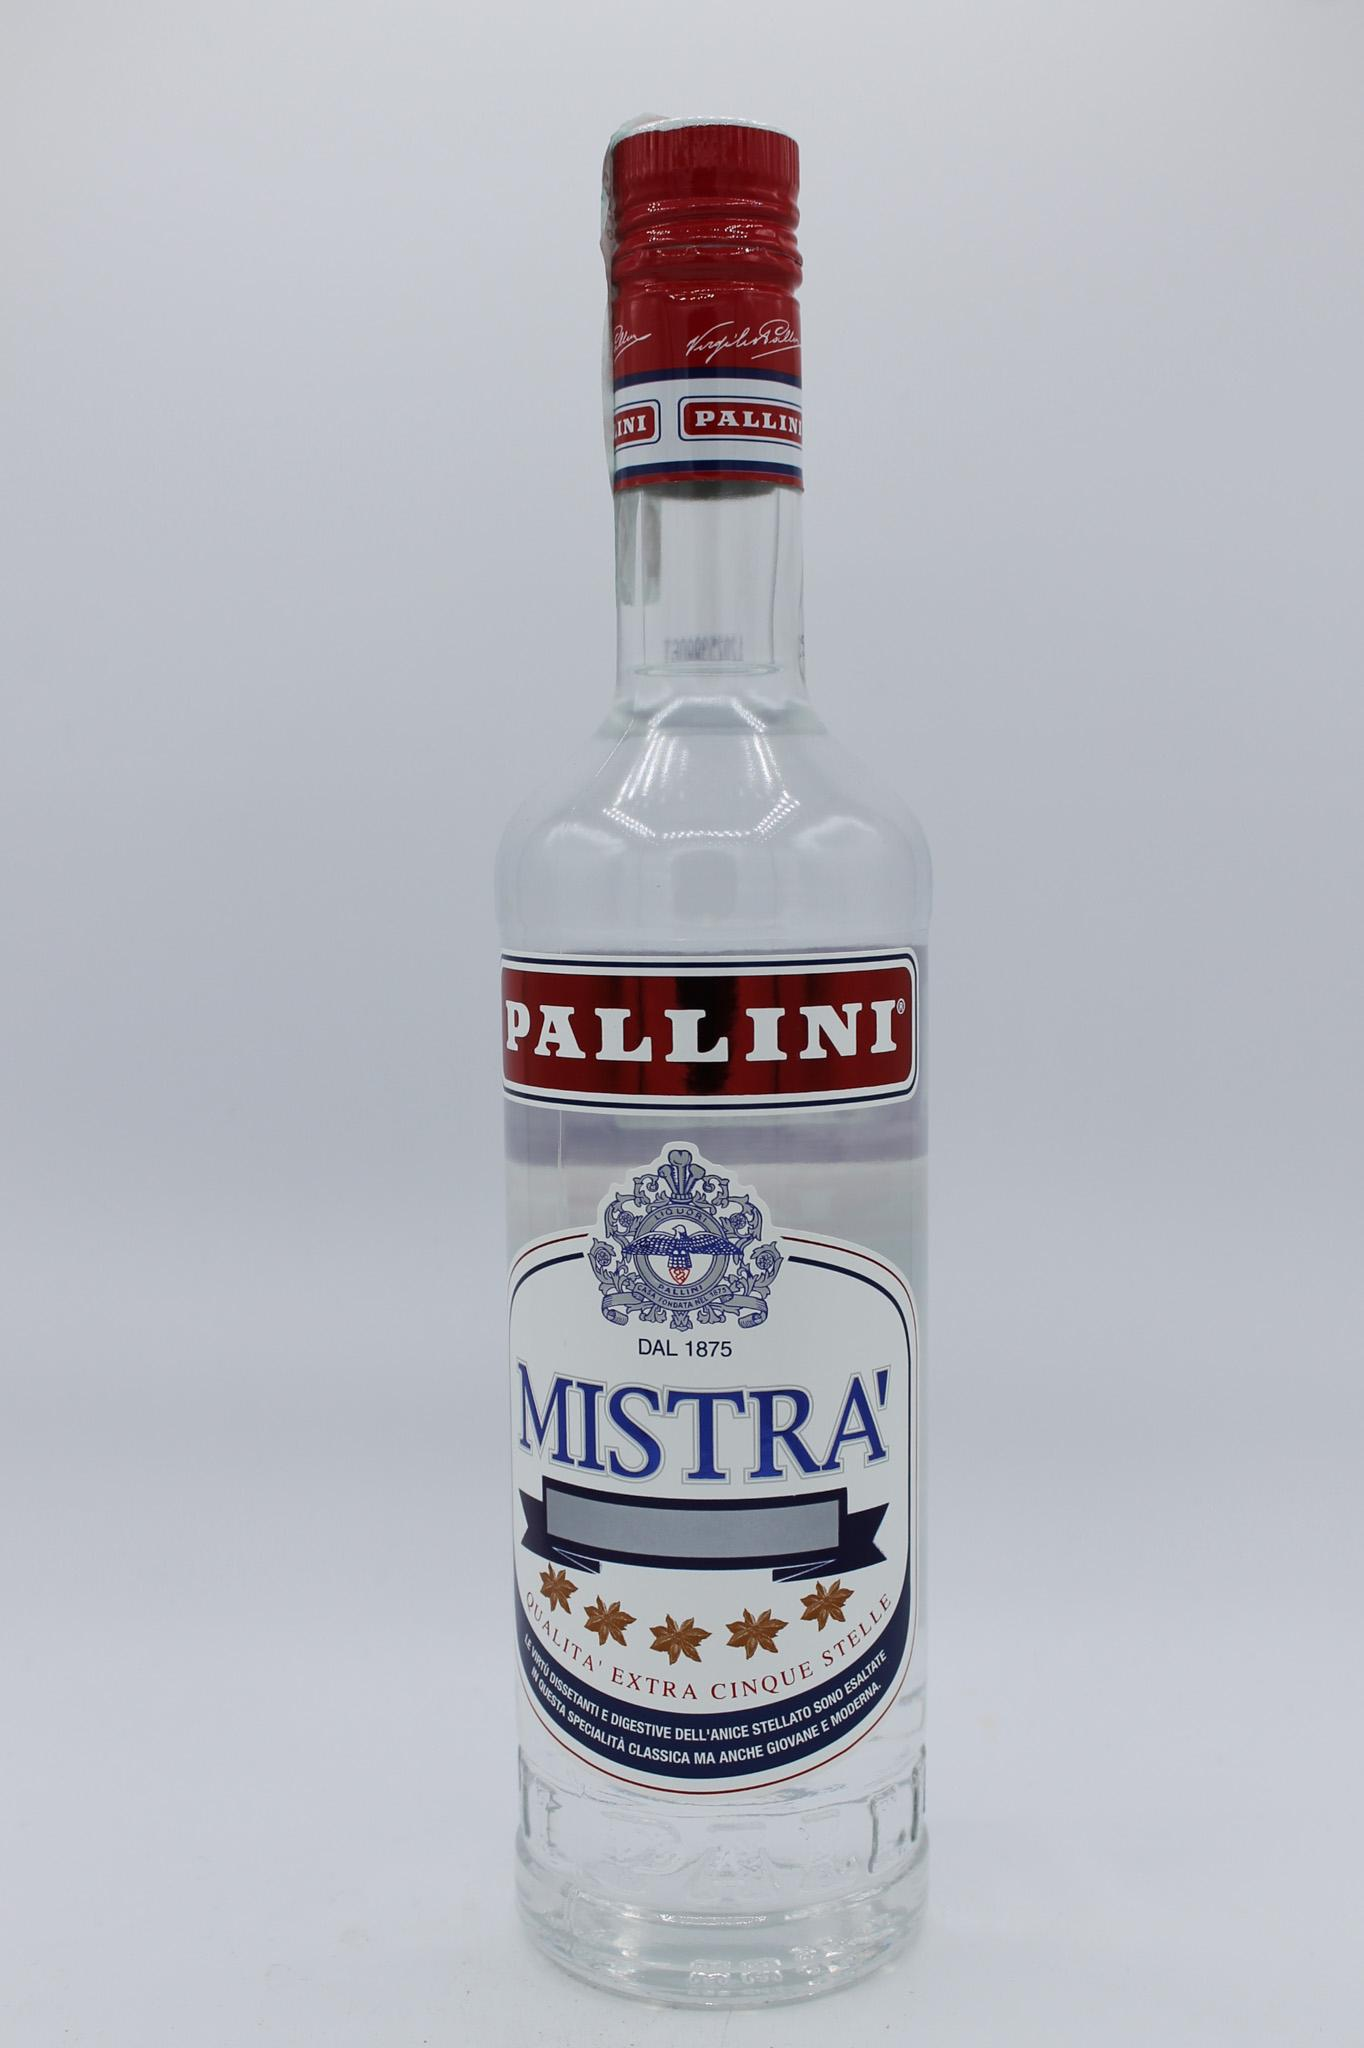 Pallini mistrà bottiglia 700ml.